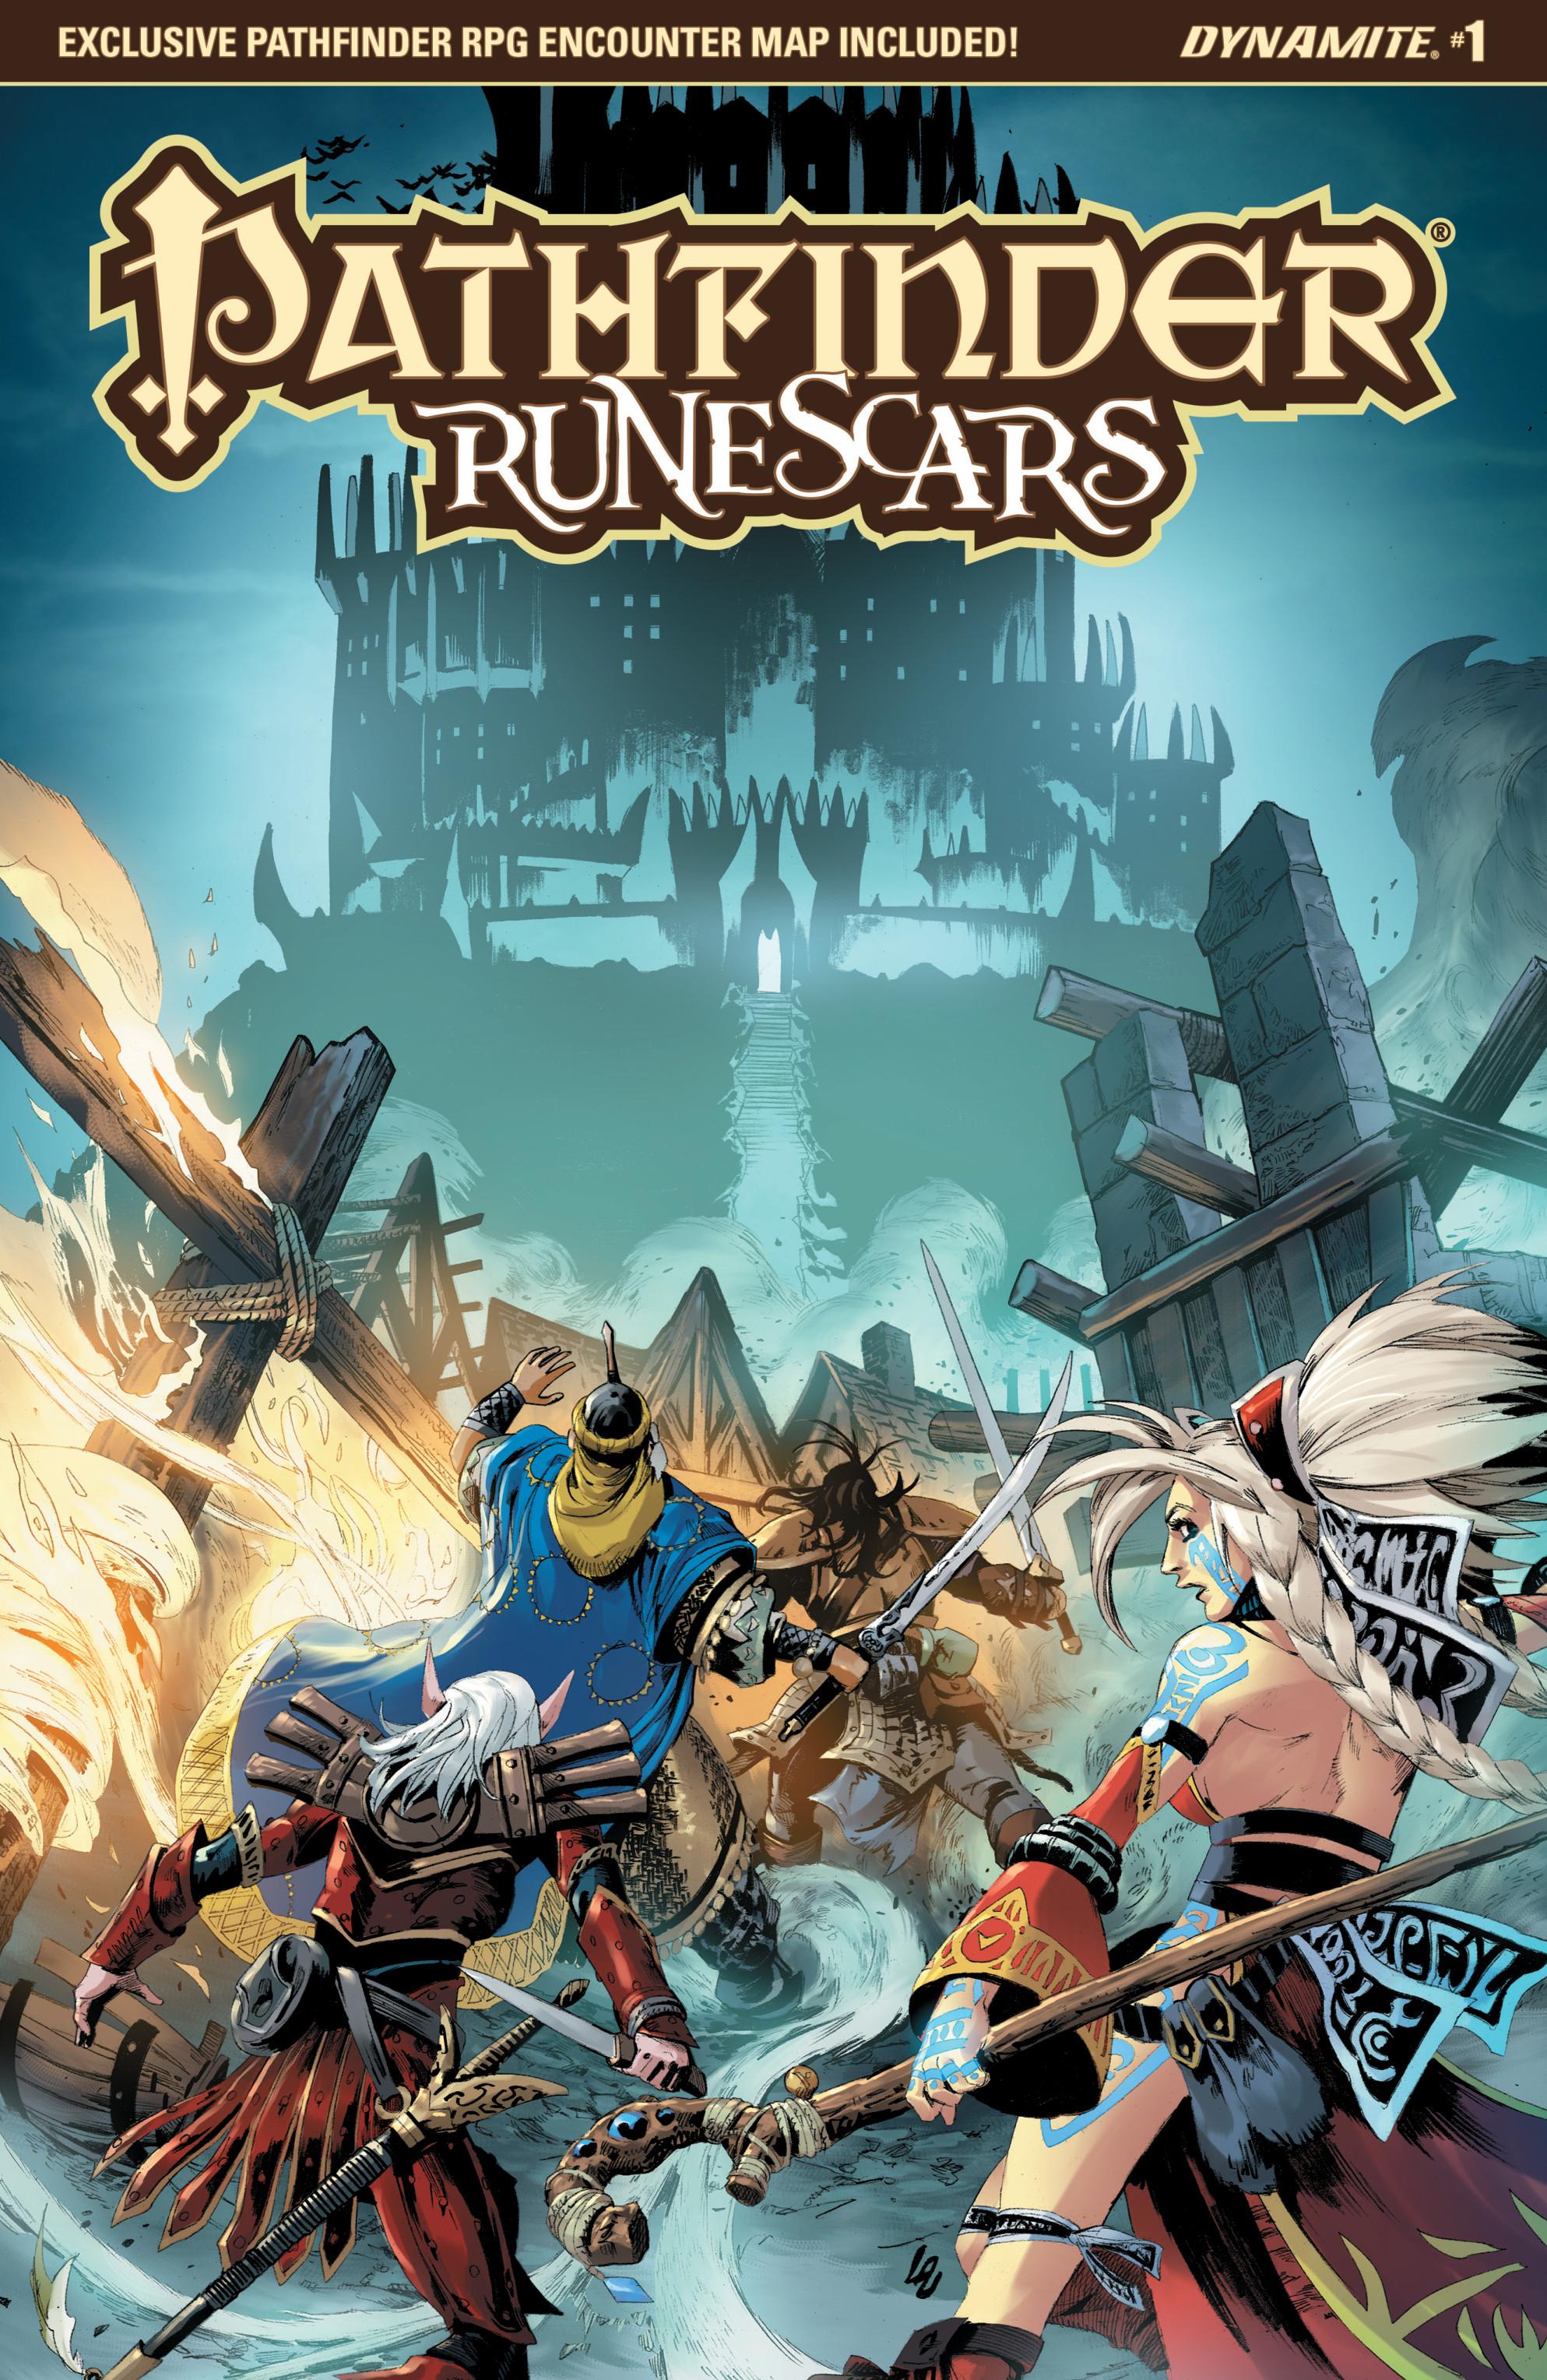 Read online Pathfinder: Runescars comic -  Issue #1 - 1